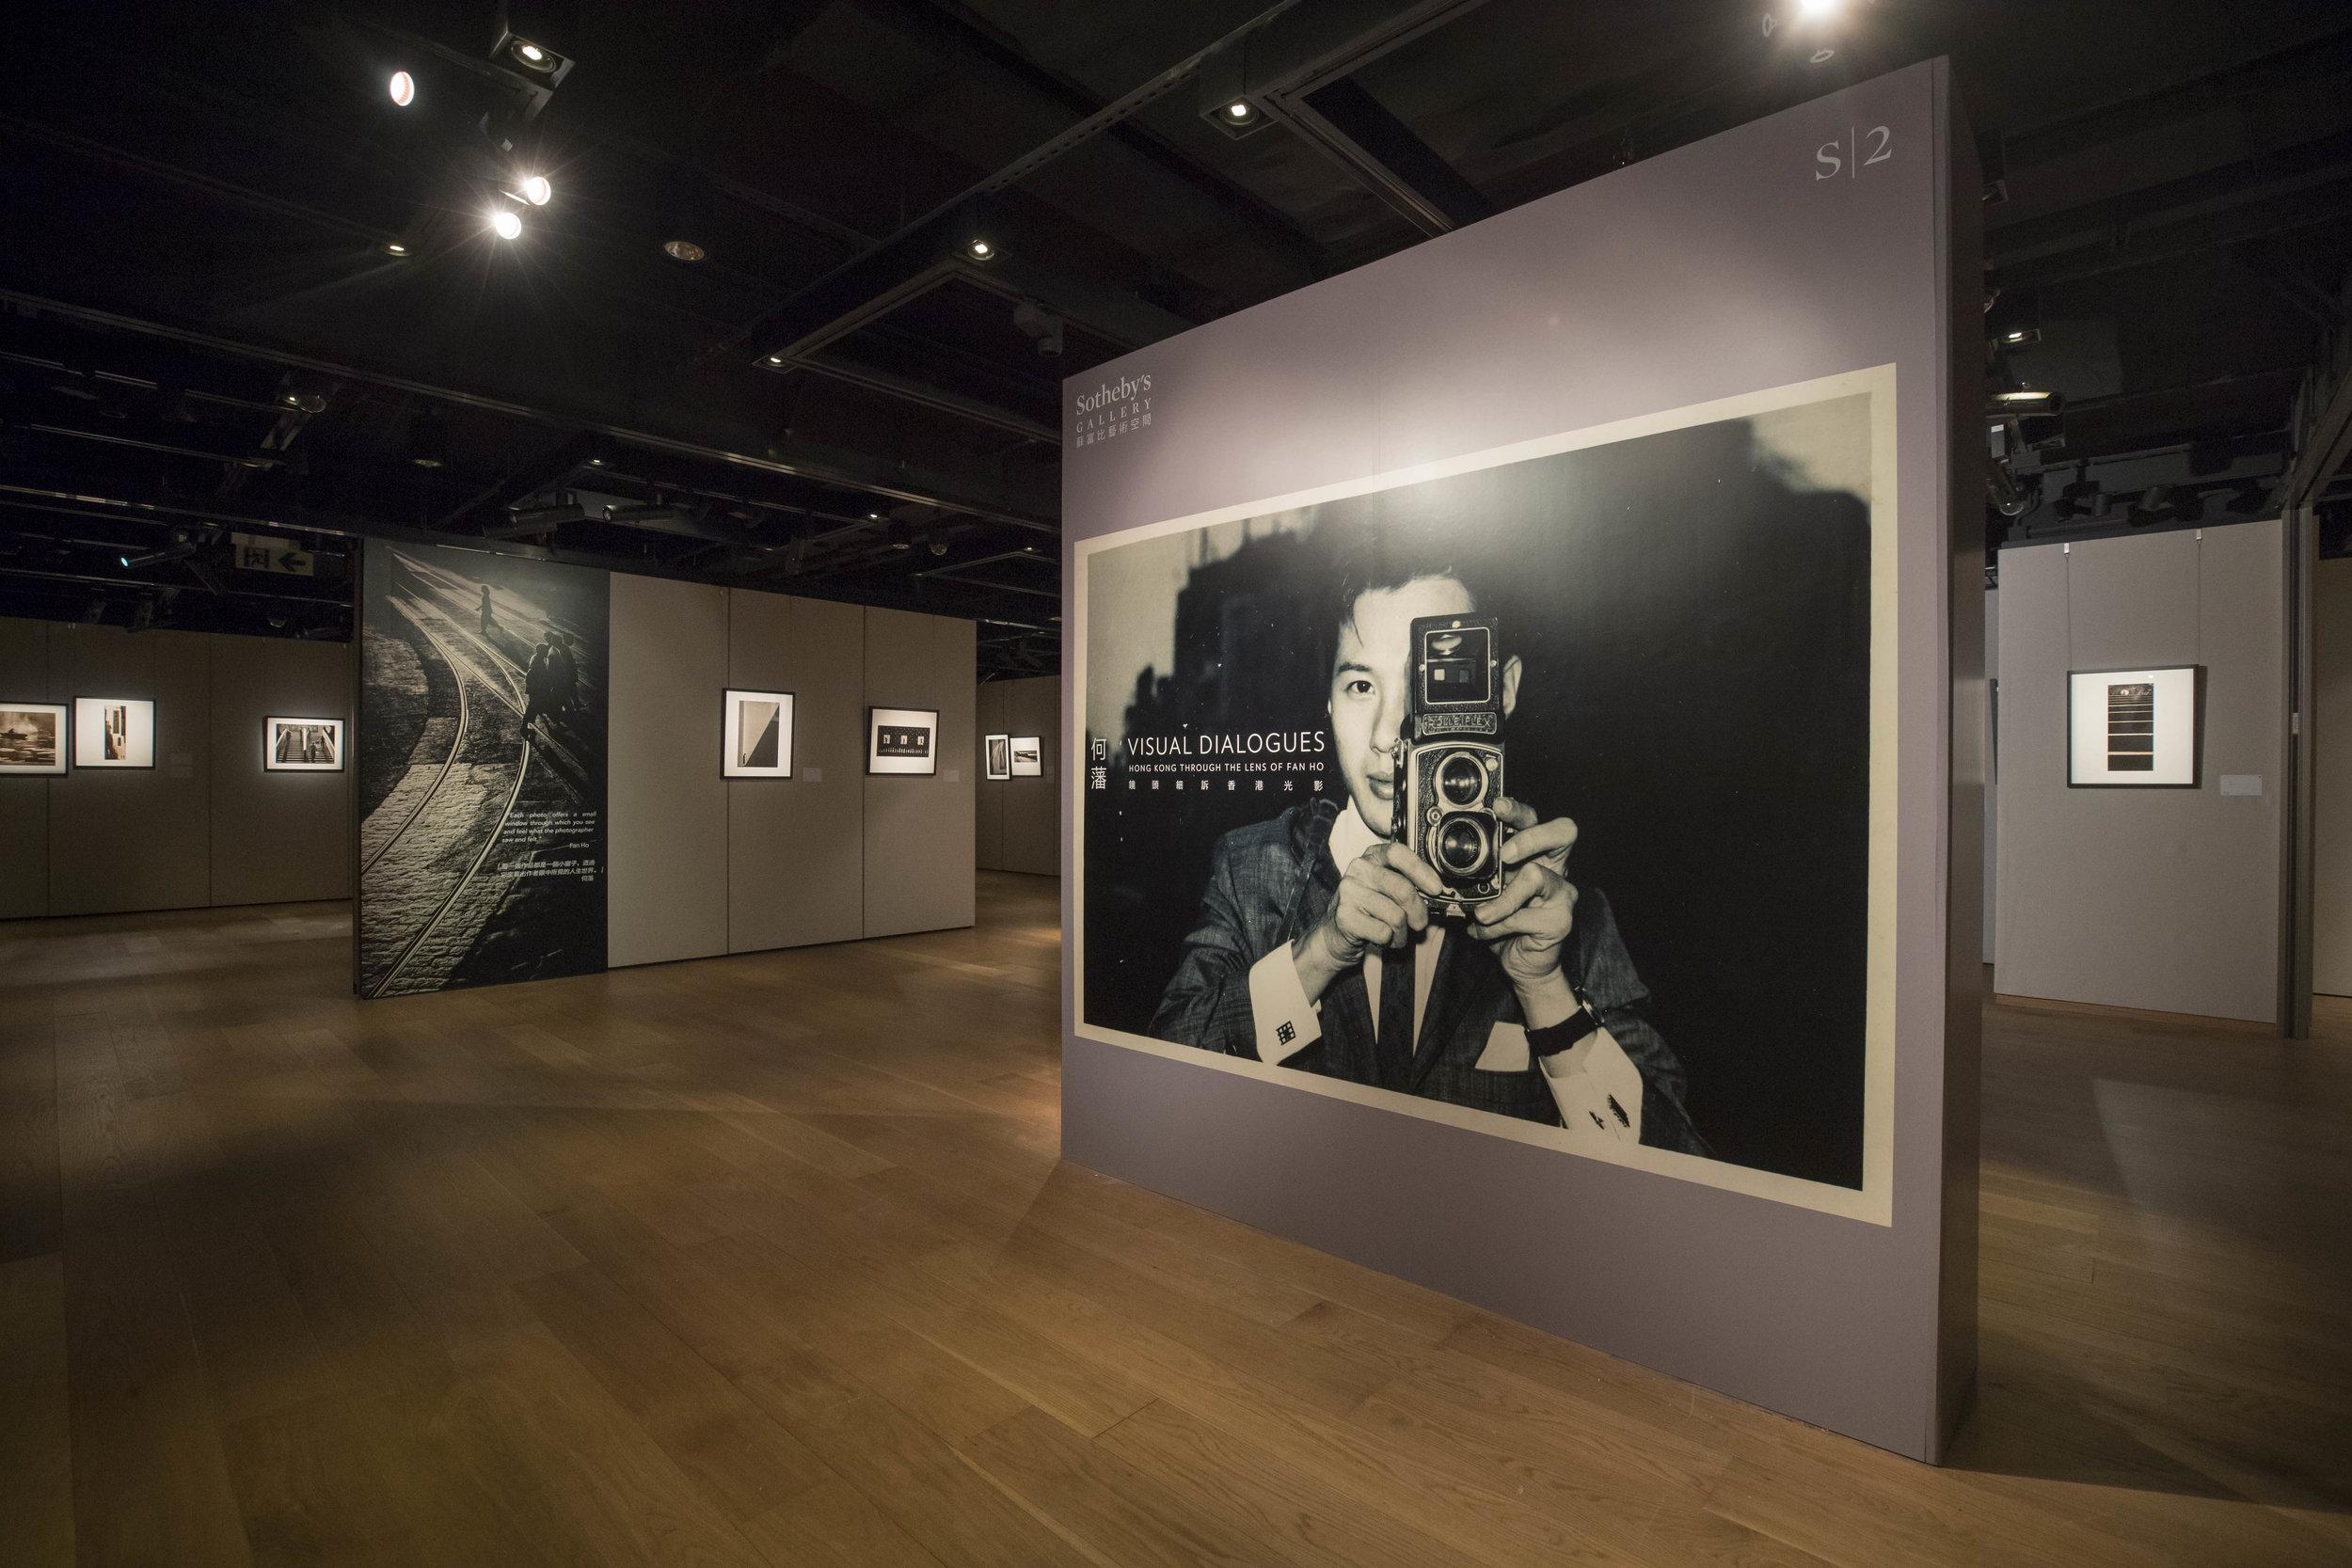 Sothebys Exhibition June 14-30, 2017